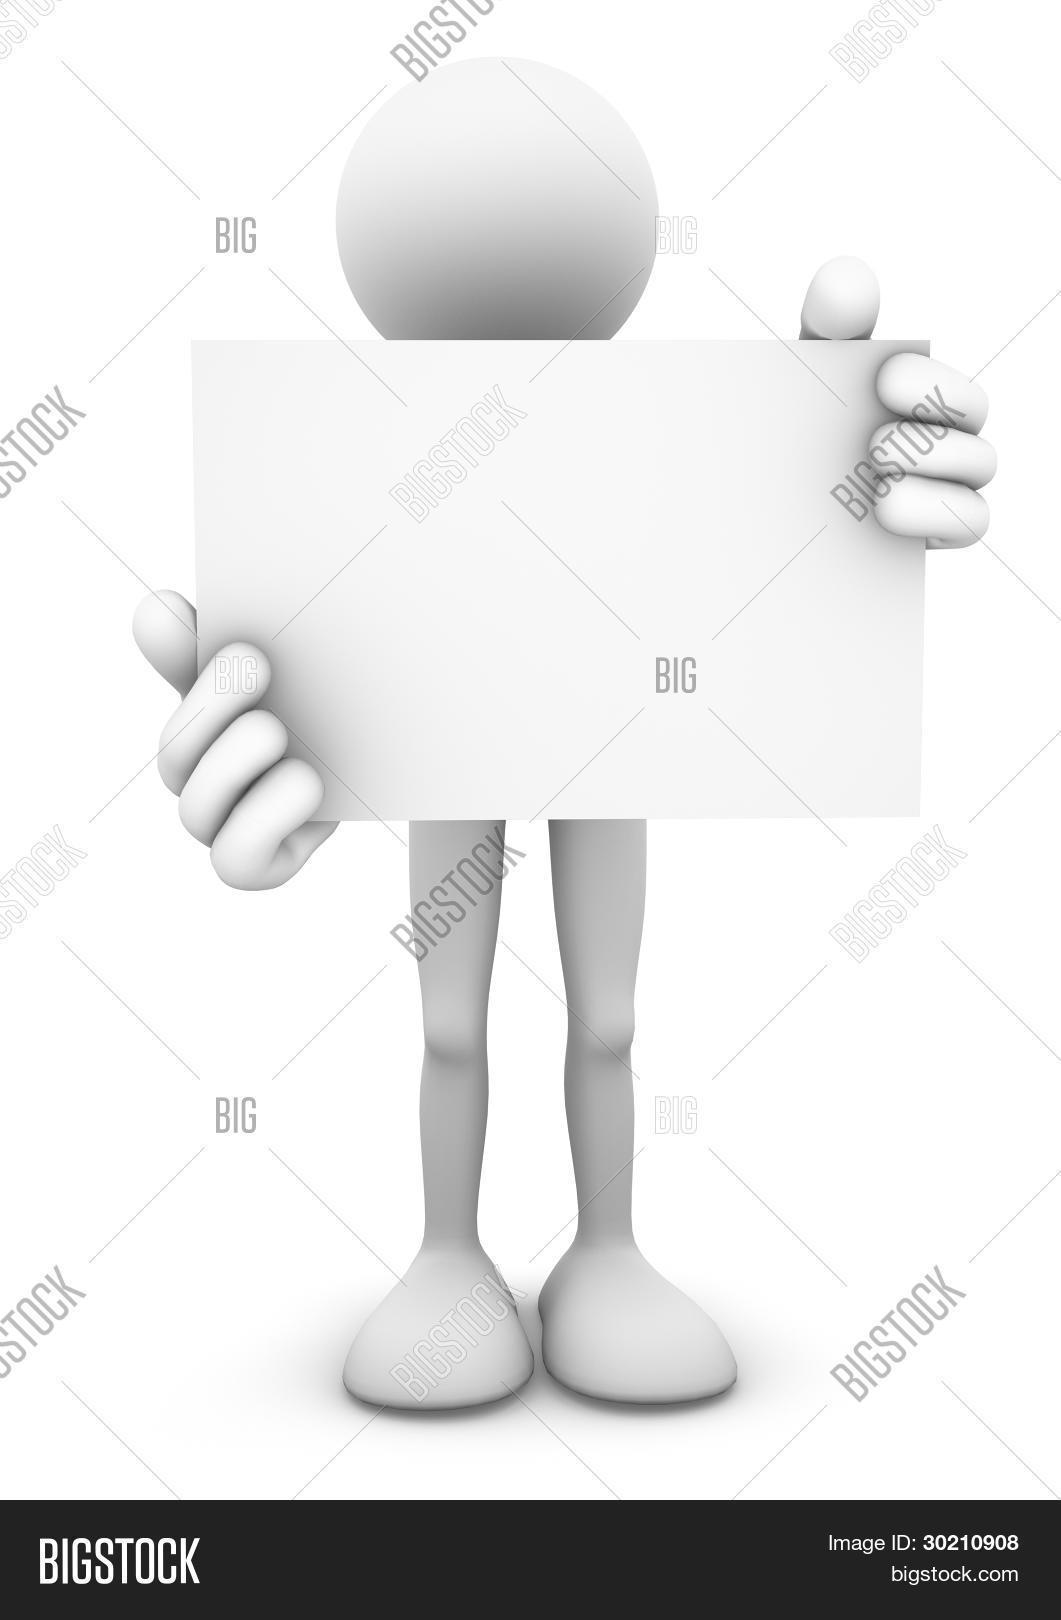 3d Stick Figure Person Image Photo Free Trial Bigstock